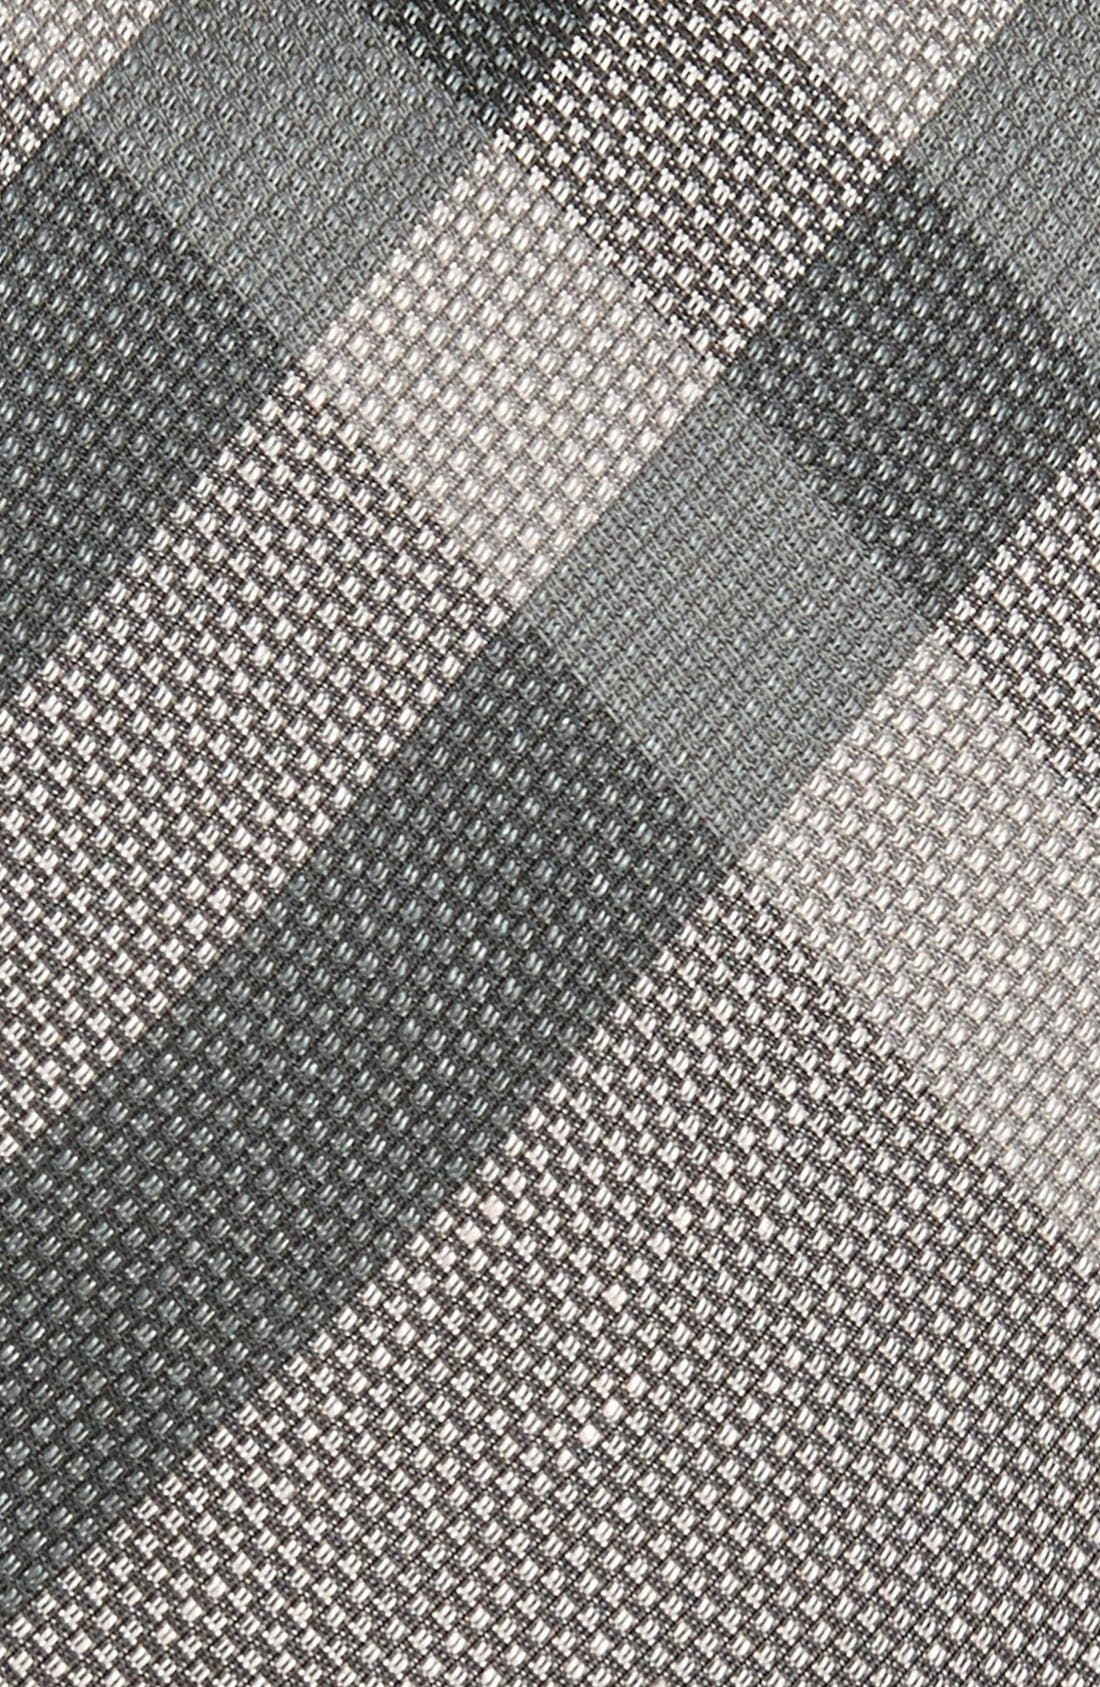 Alternate Image 2  - Burberry London Woven Tie